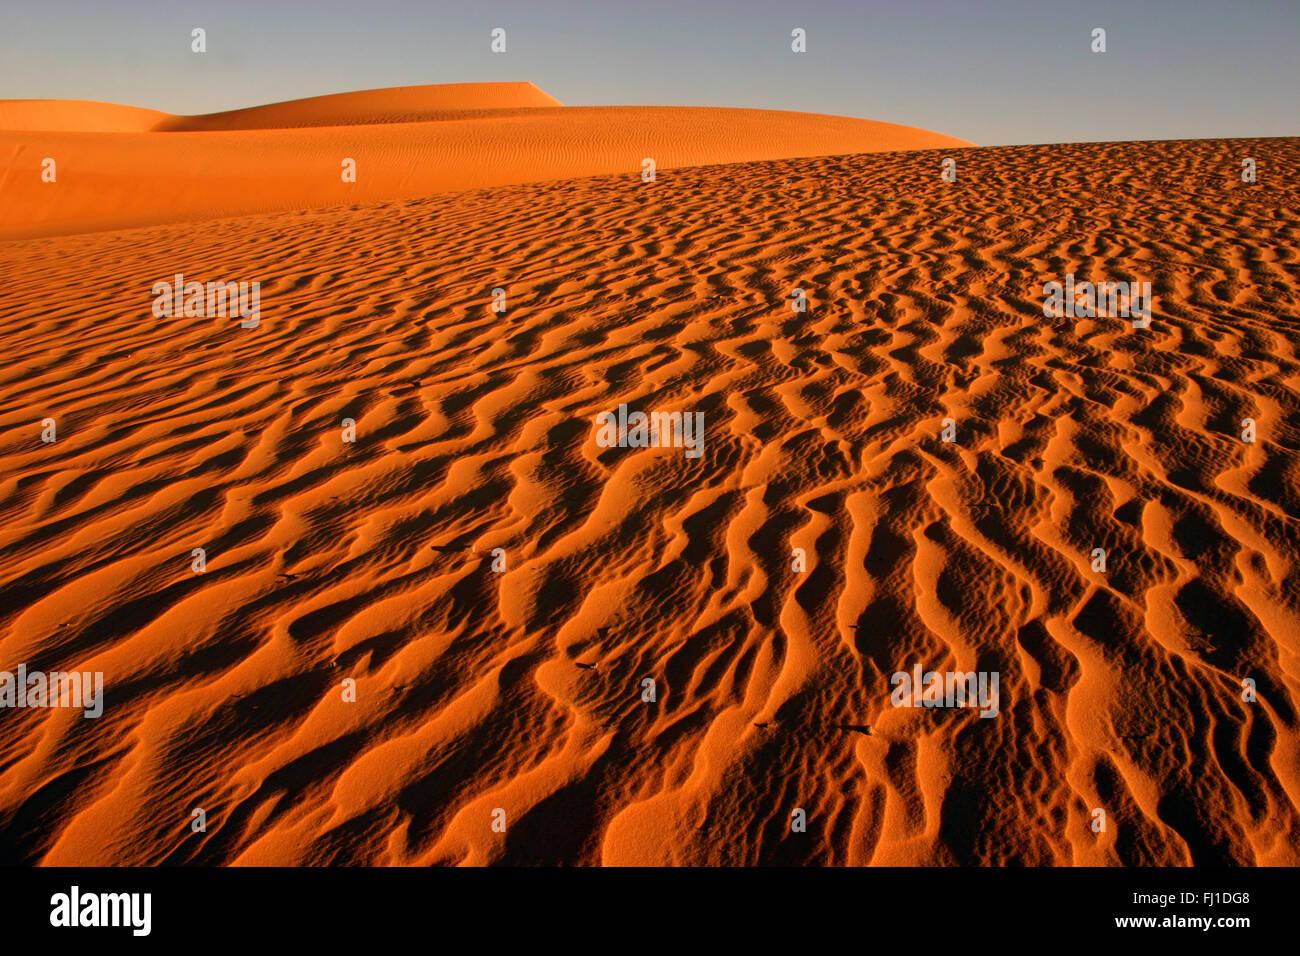 Chinguetti : landscape near city, desert with golden orange sands , Mauritania - Stock Image